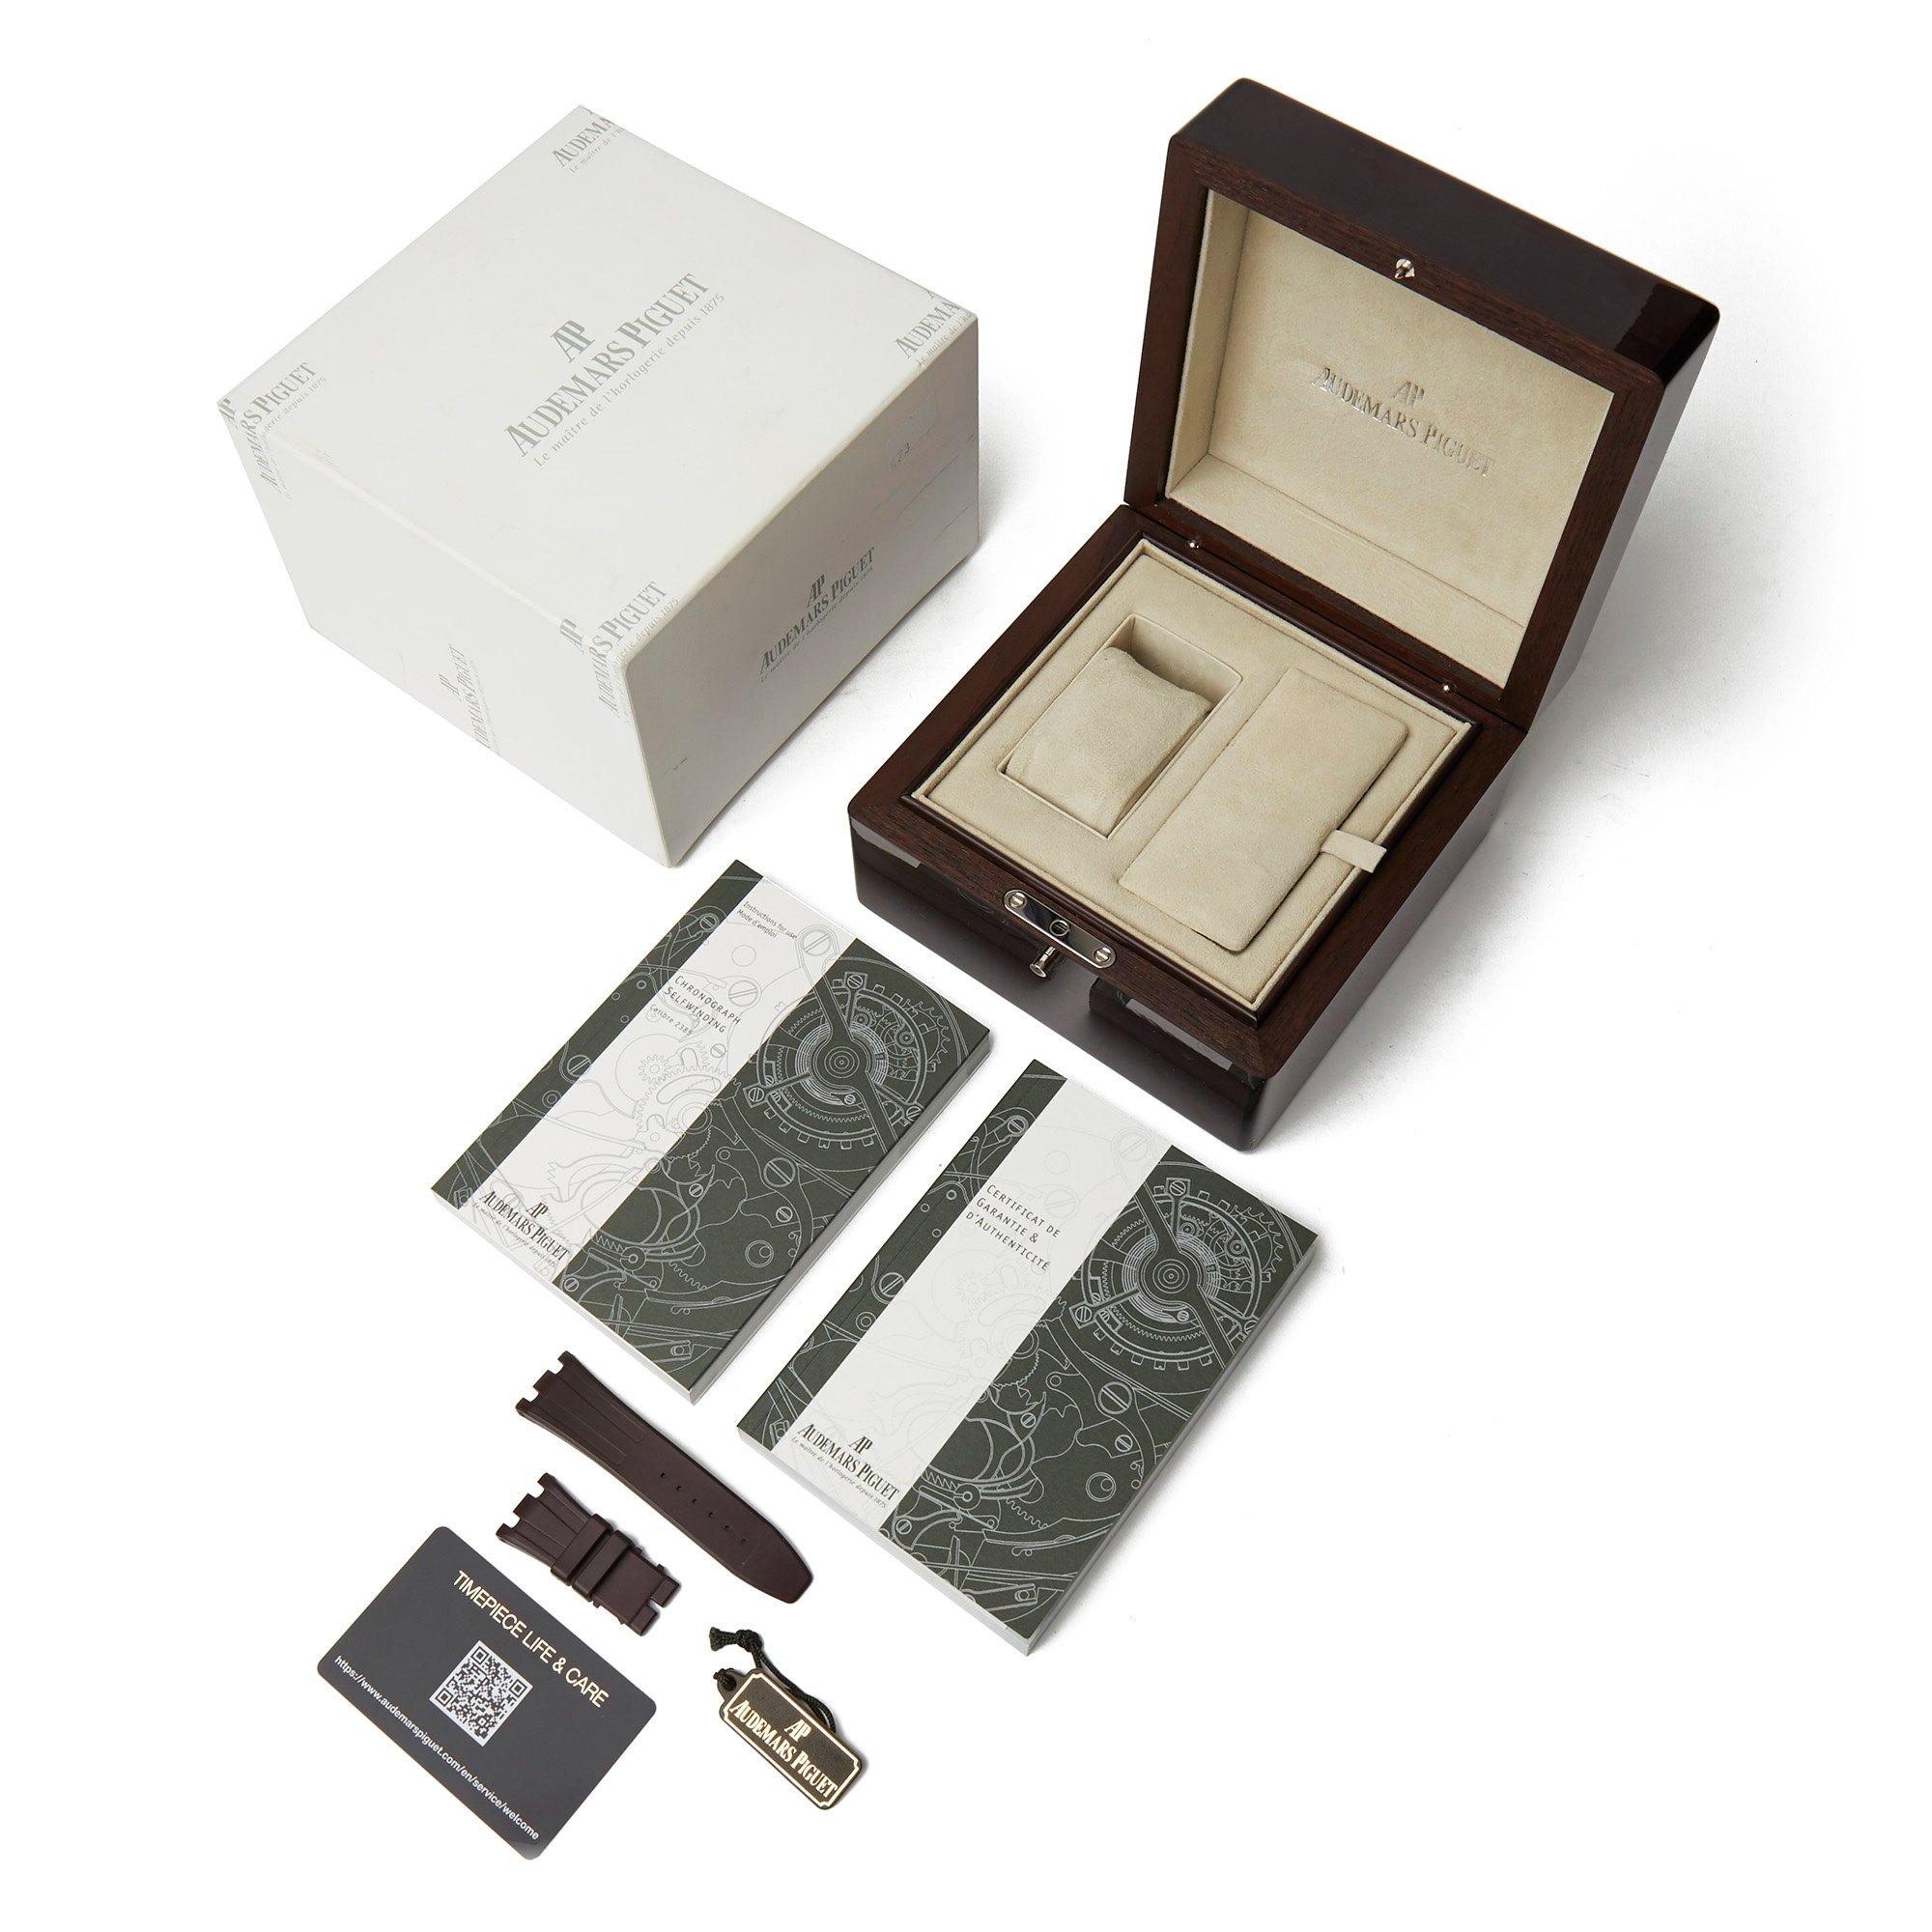 Audemars Piguet Royal Oak Offshore Diamond Chronograph Stainless Steel 26048SK.ZZ.D066CA.01